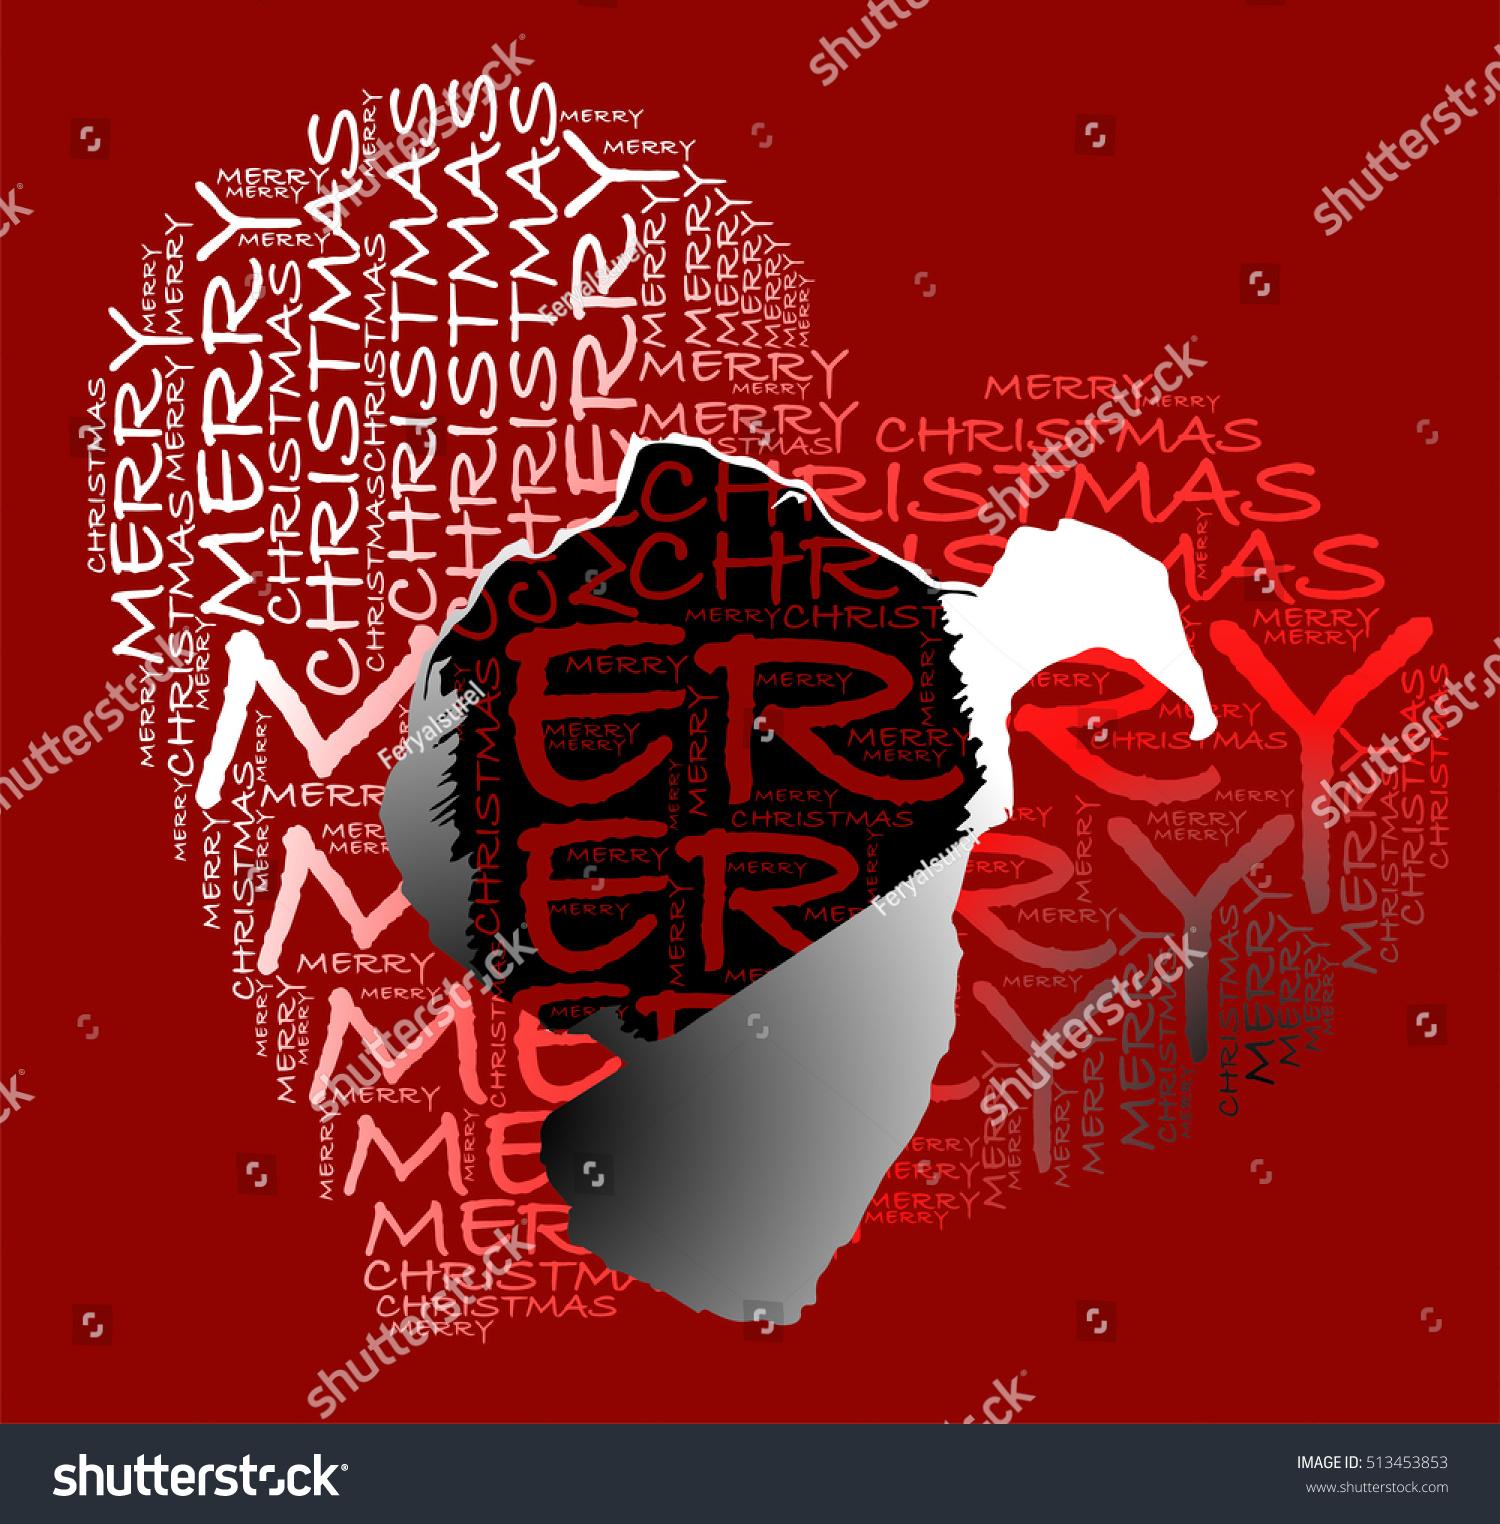 Merry Christmas Text Heart Shape Silhouette Stock Vector (Royalty ...